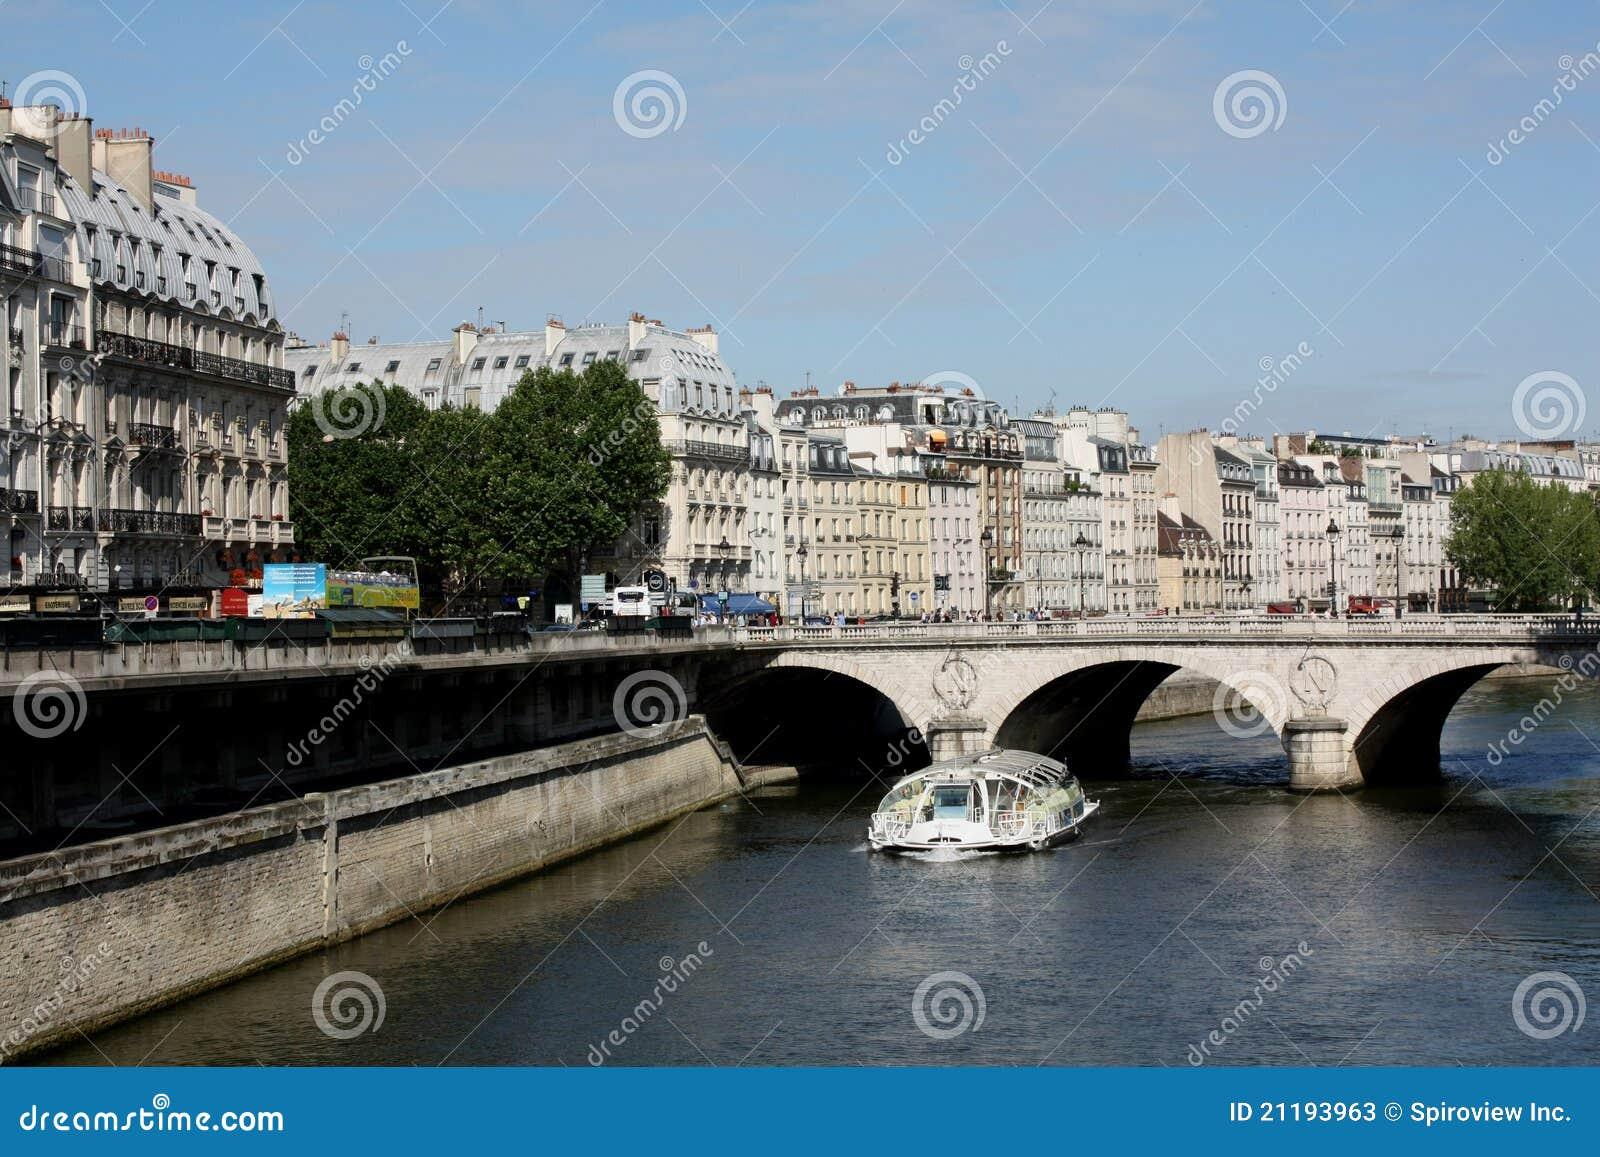 Paris, Left Bank of the Seine